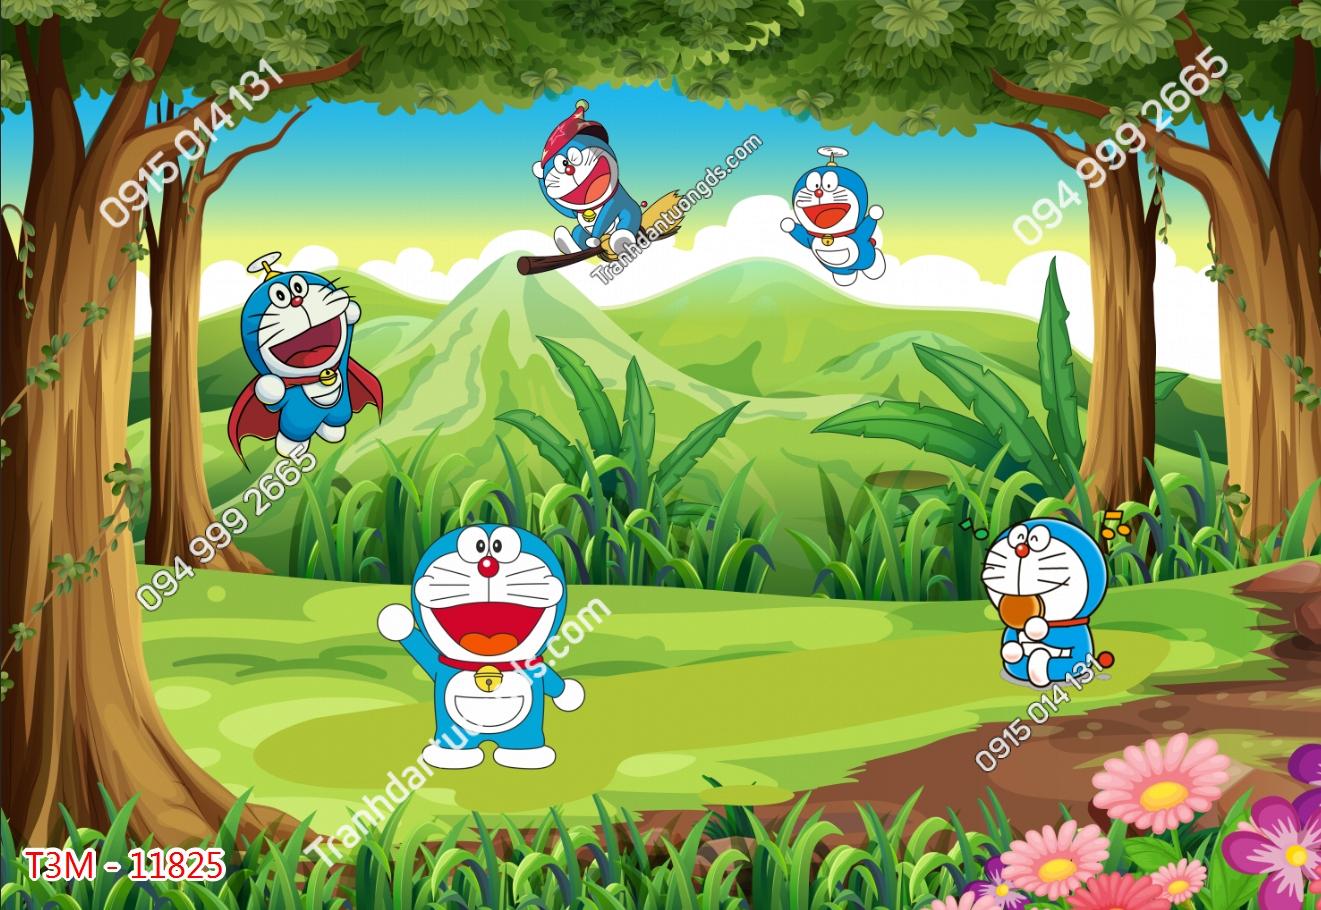 Tranh dán tường Doraemon - 11825 demo